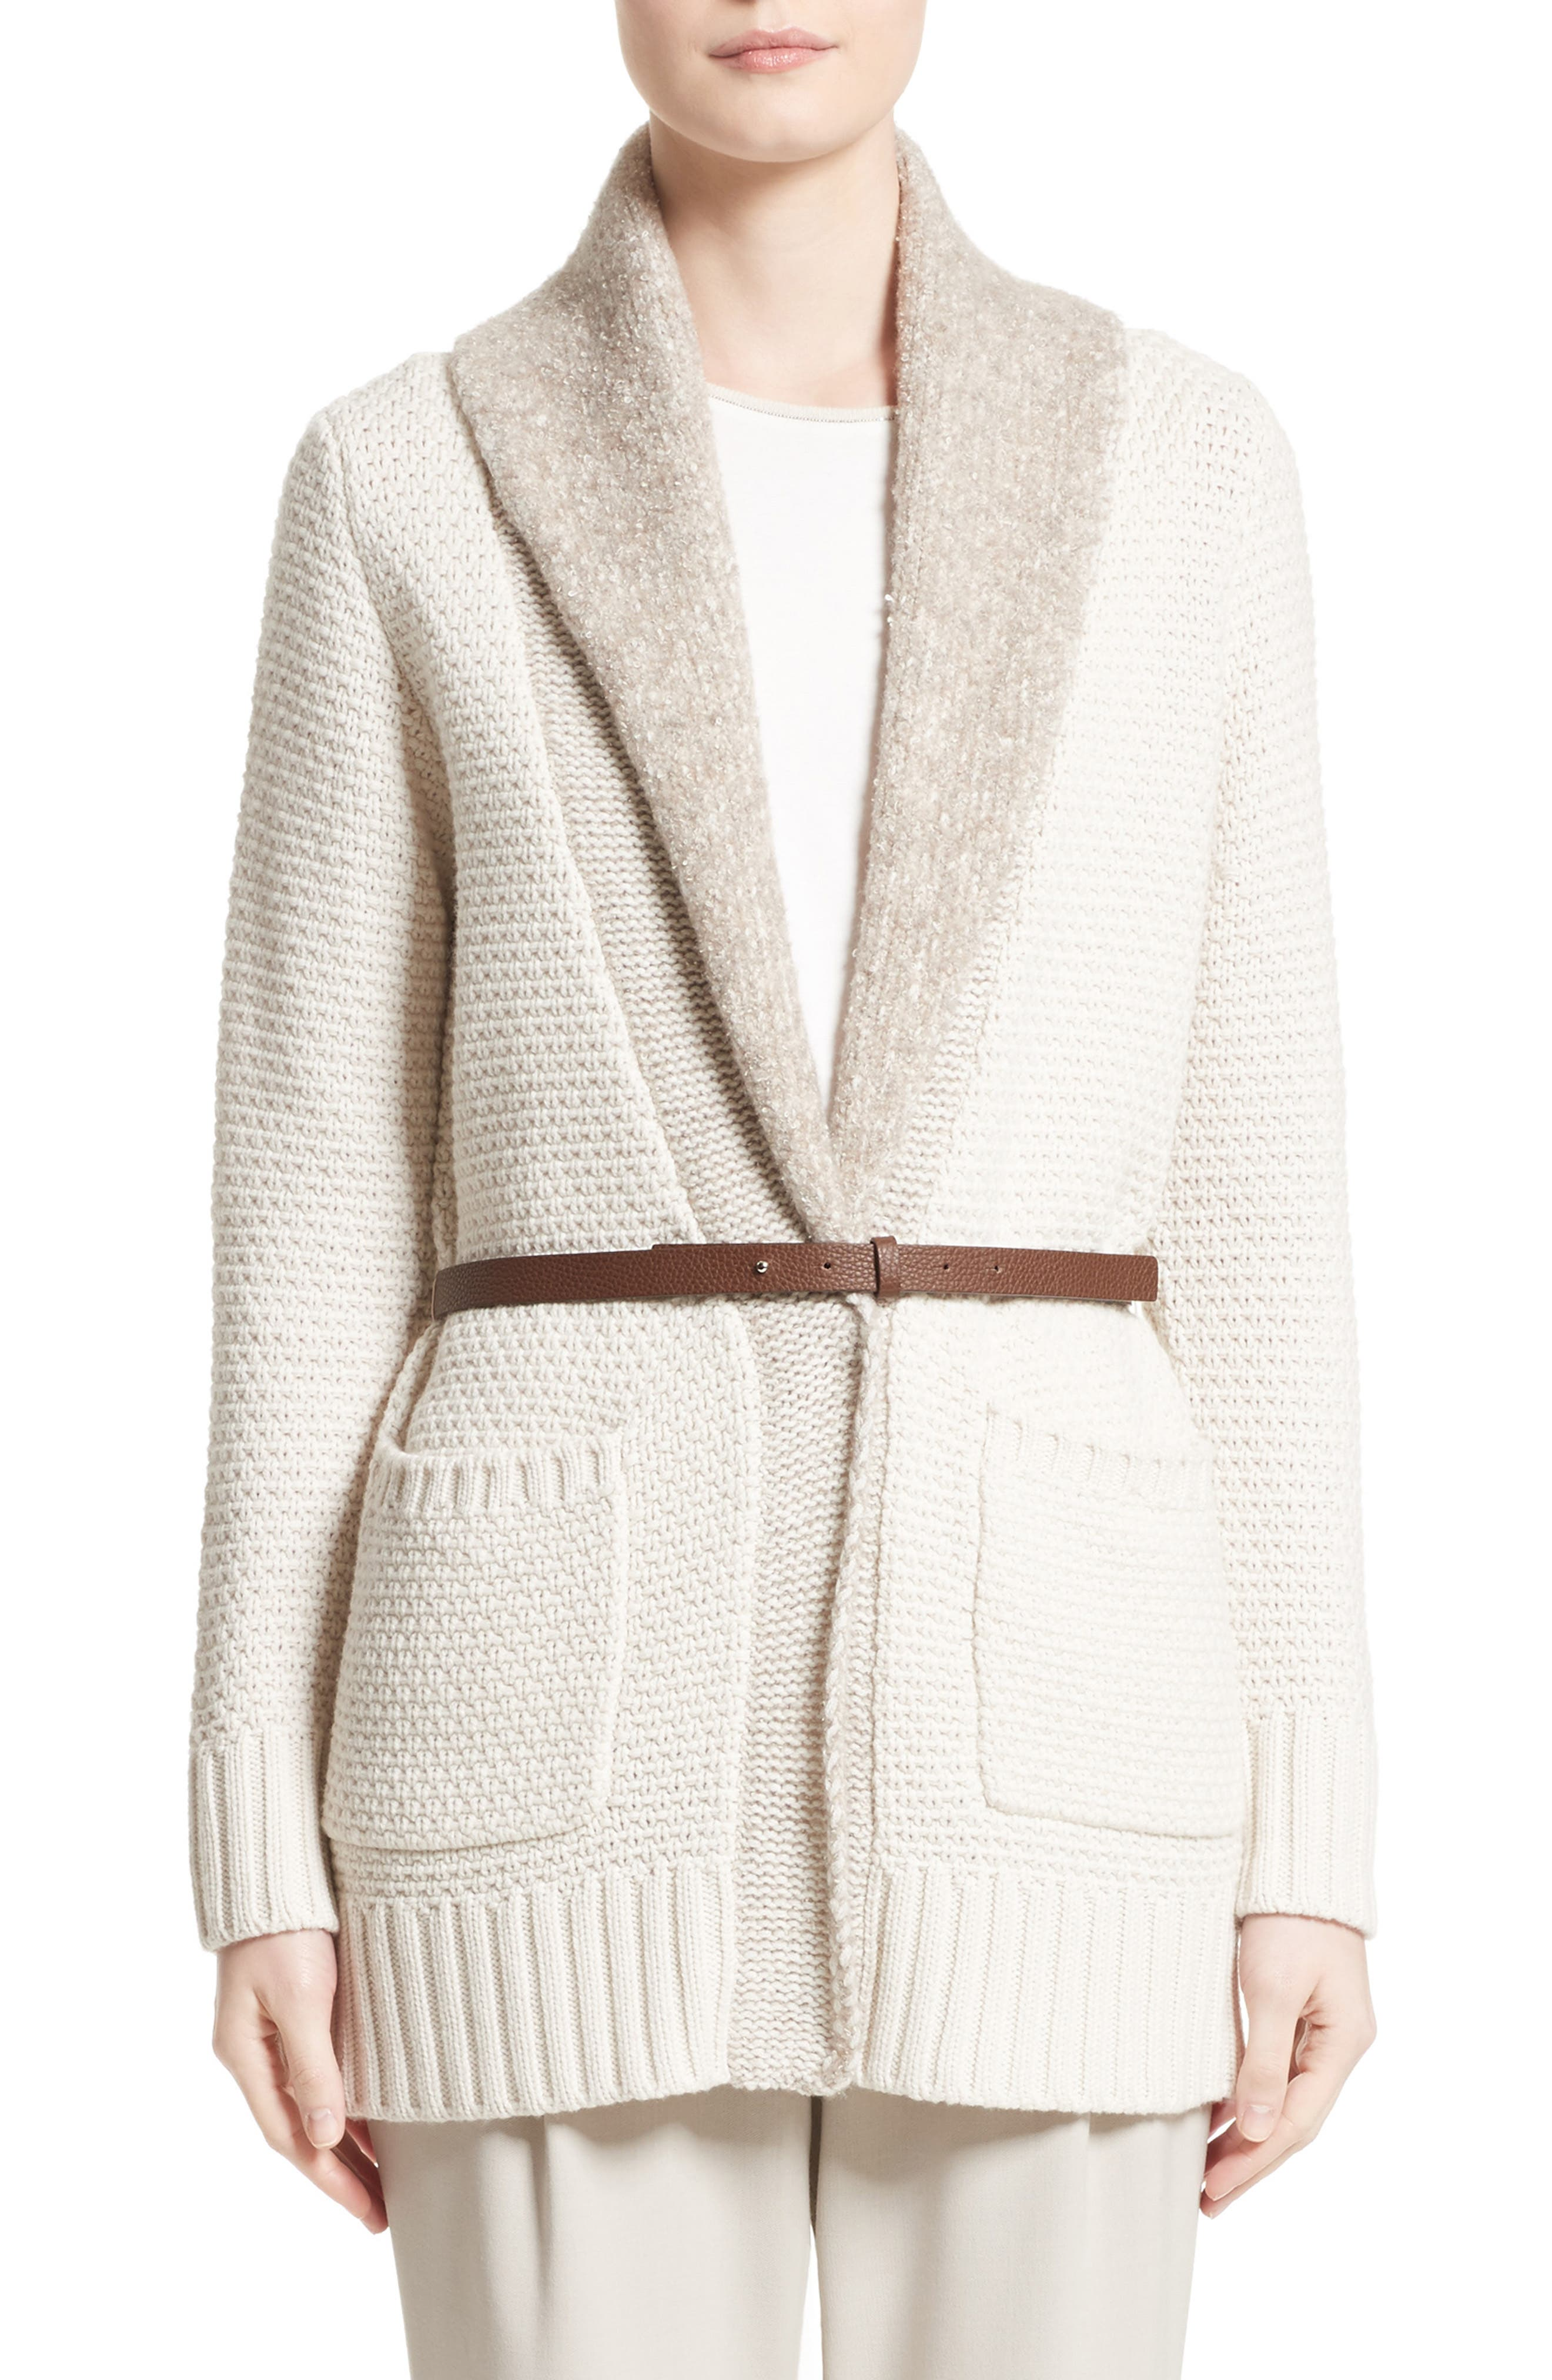 Fabiana Filippi Wool, Silk & Cashmere Knit Cardigan